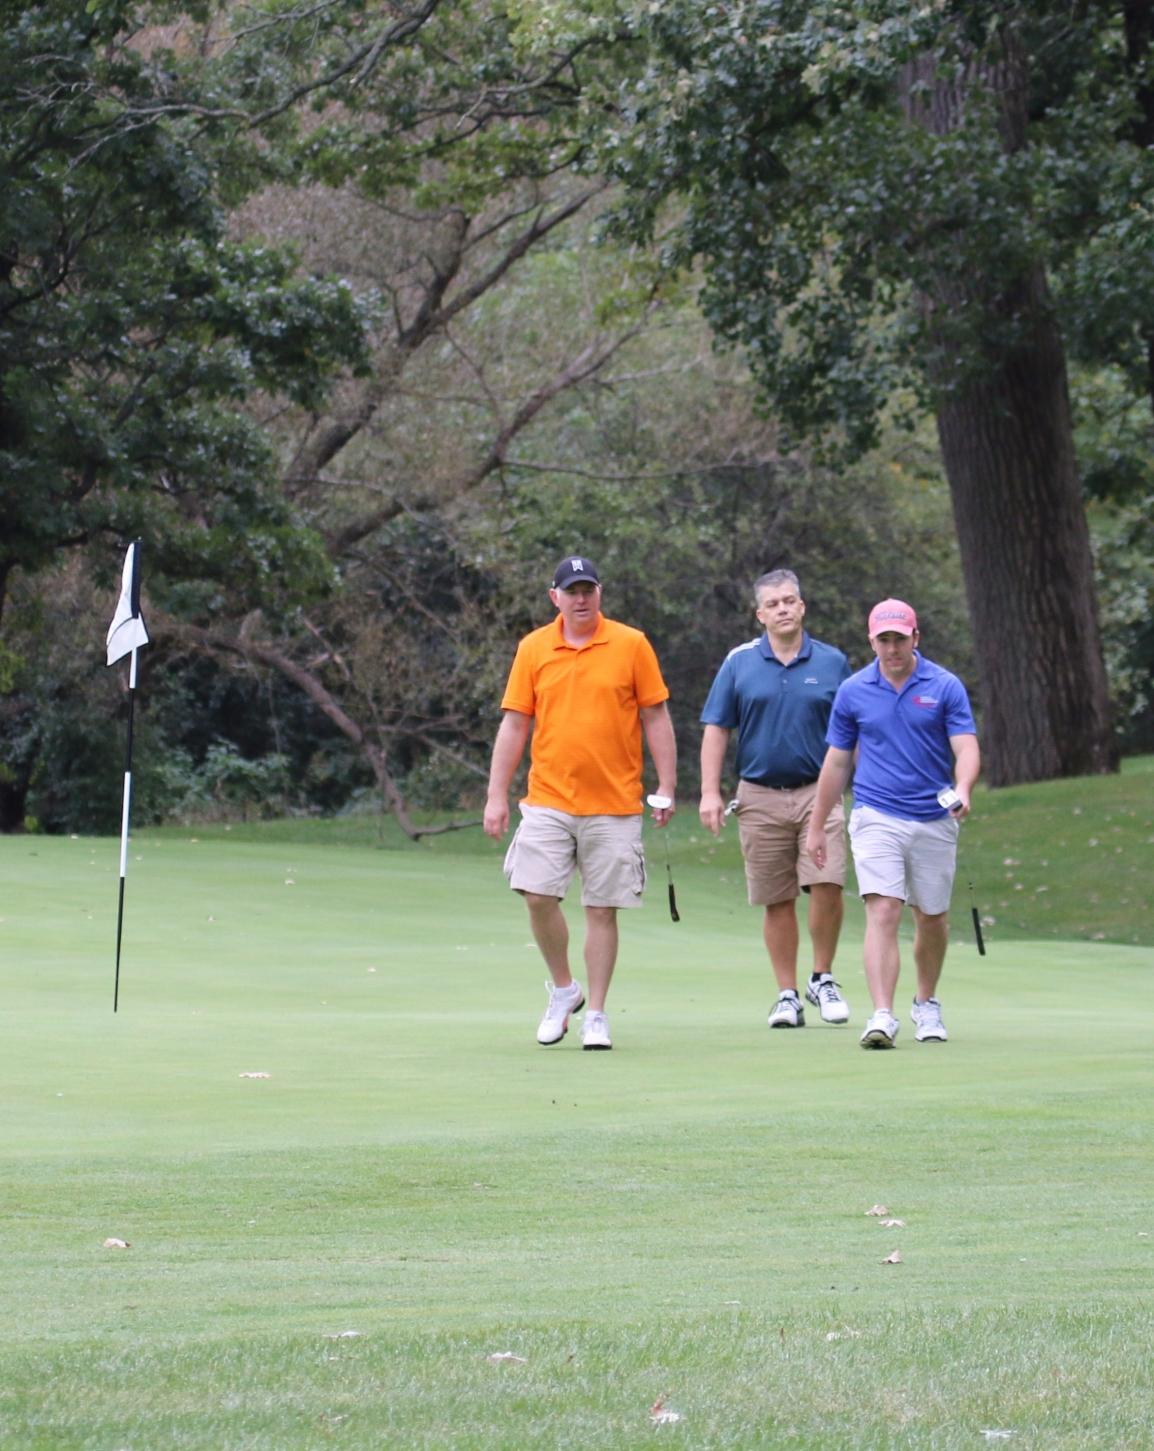 2017 Charity GolfOuting